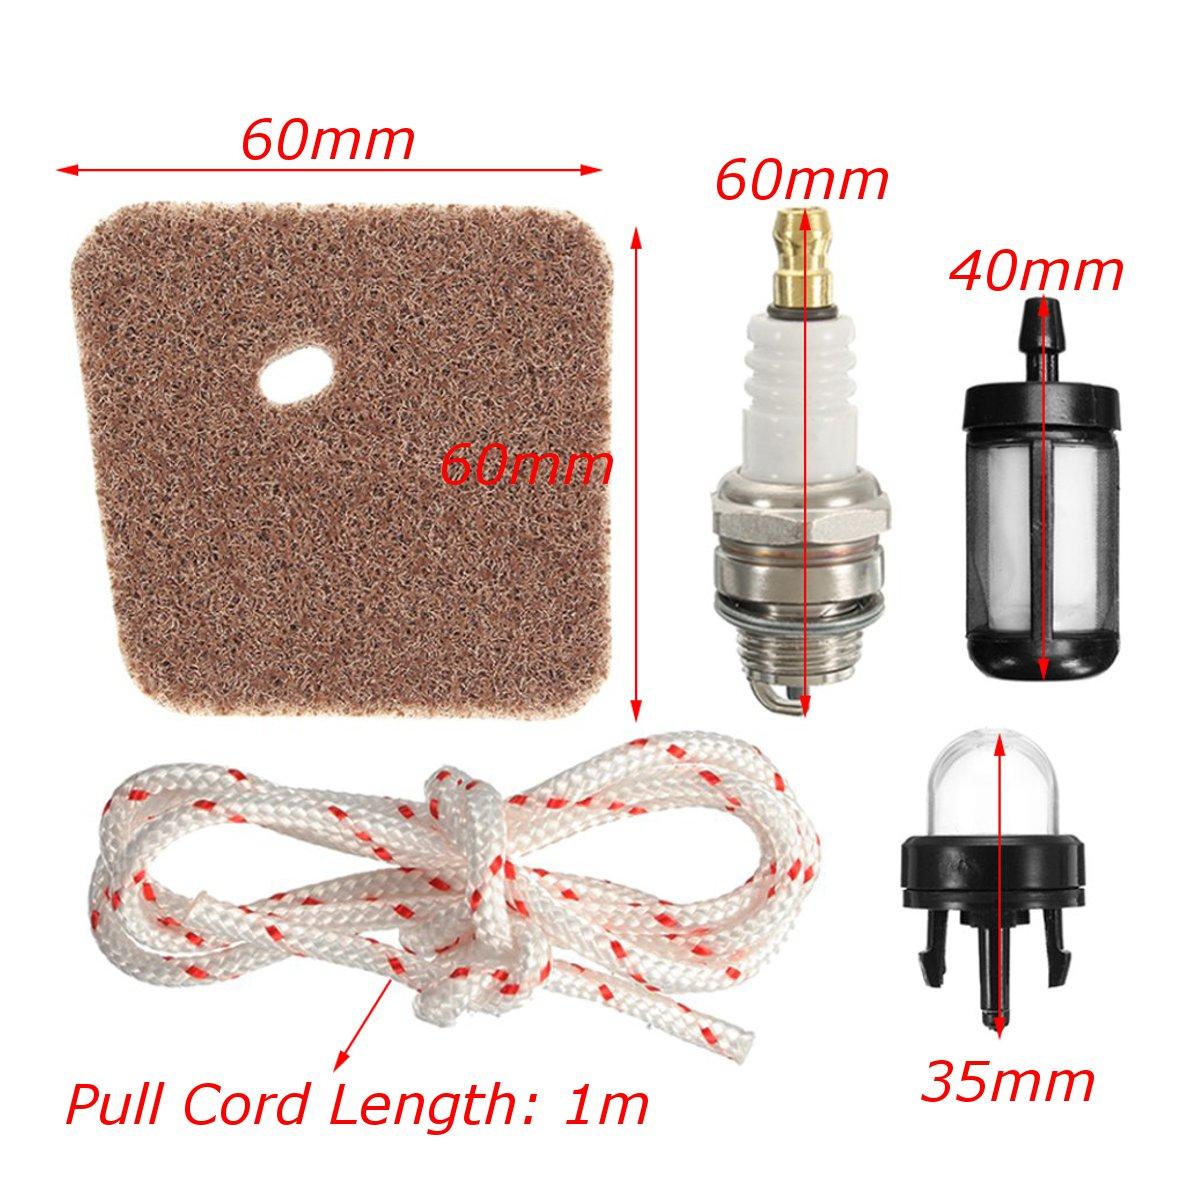 Air Filter Spark Plug Full Service Kit For HS45 Petrol Hedge Cutter Trimmer